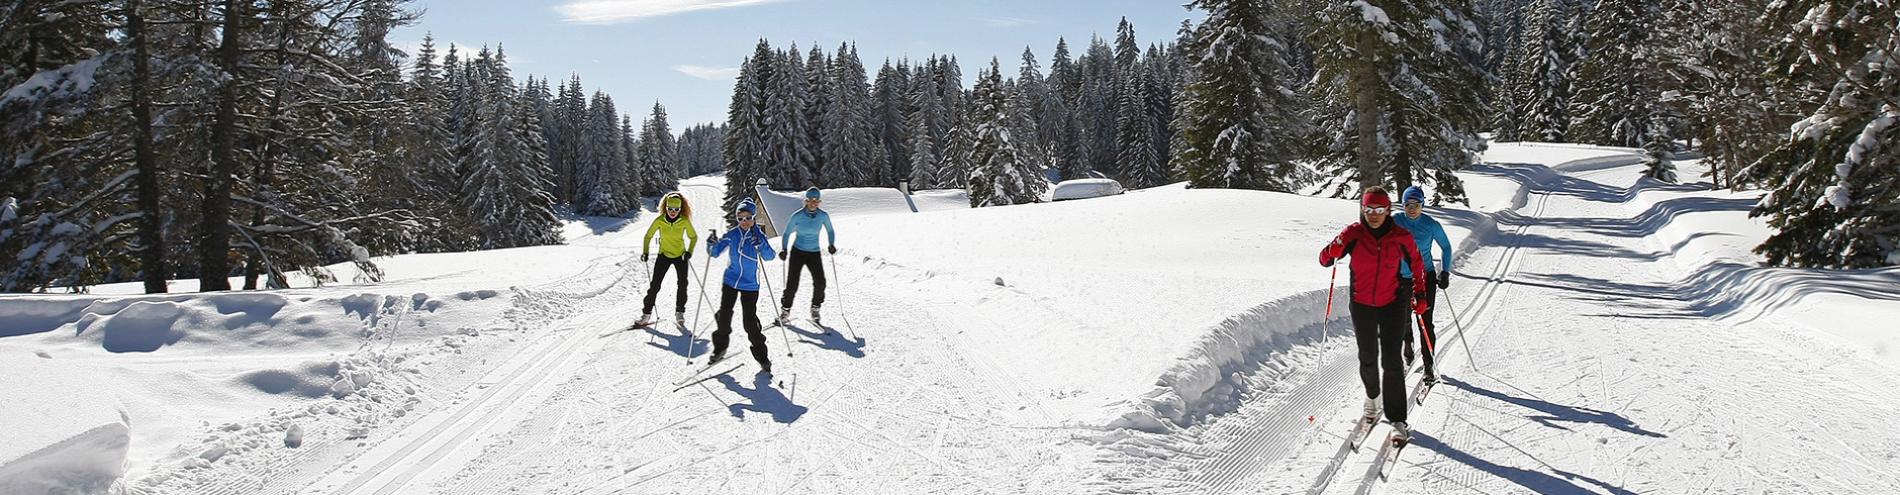 Woka loisirs - Activités Hivernales > Ski Nordique